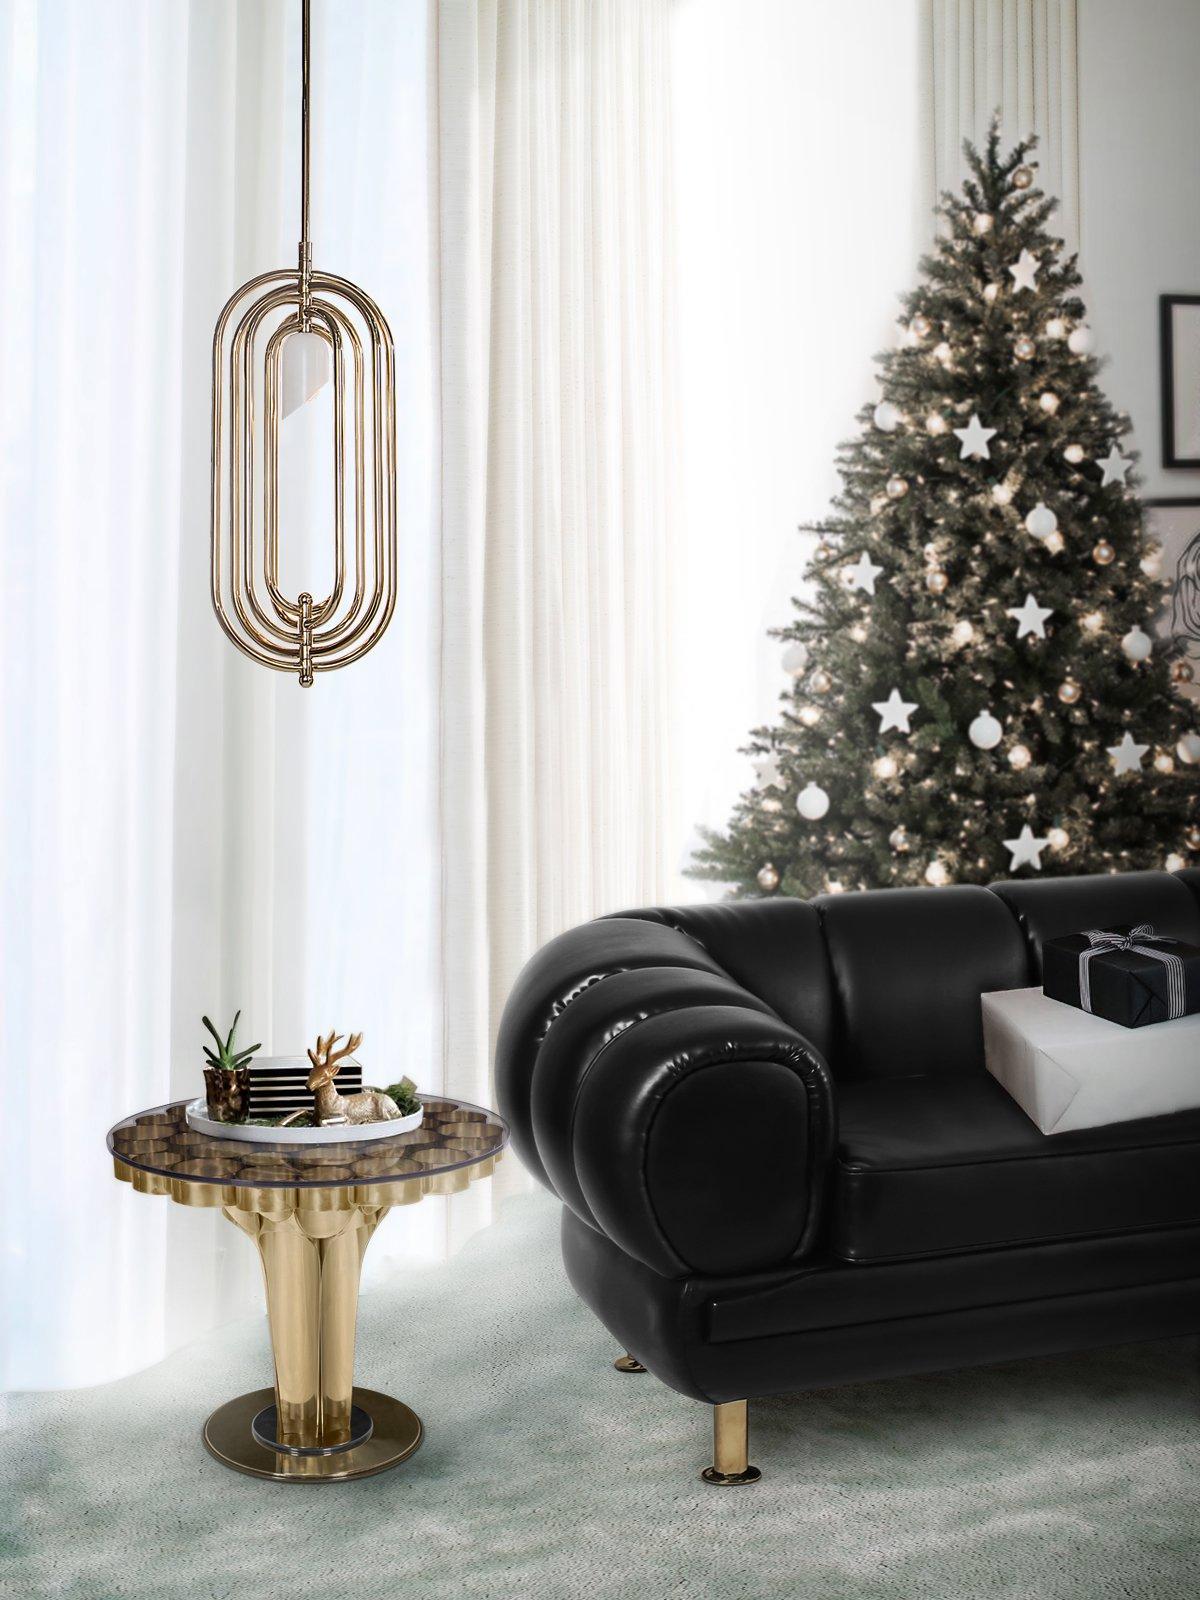 Top 7 Candeeiros Para Obter A Melhor Iluminação De Natal Em Sua Casa 7 iluminação de Natal